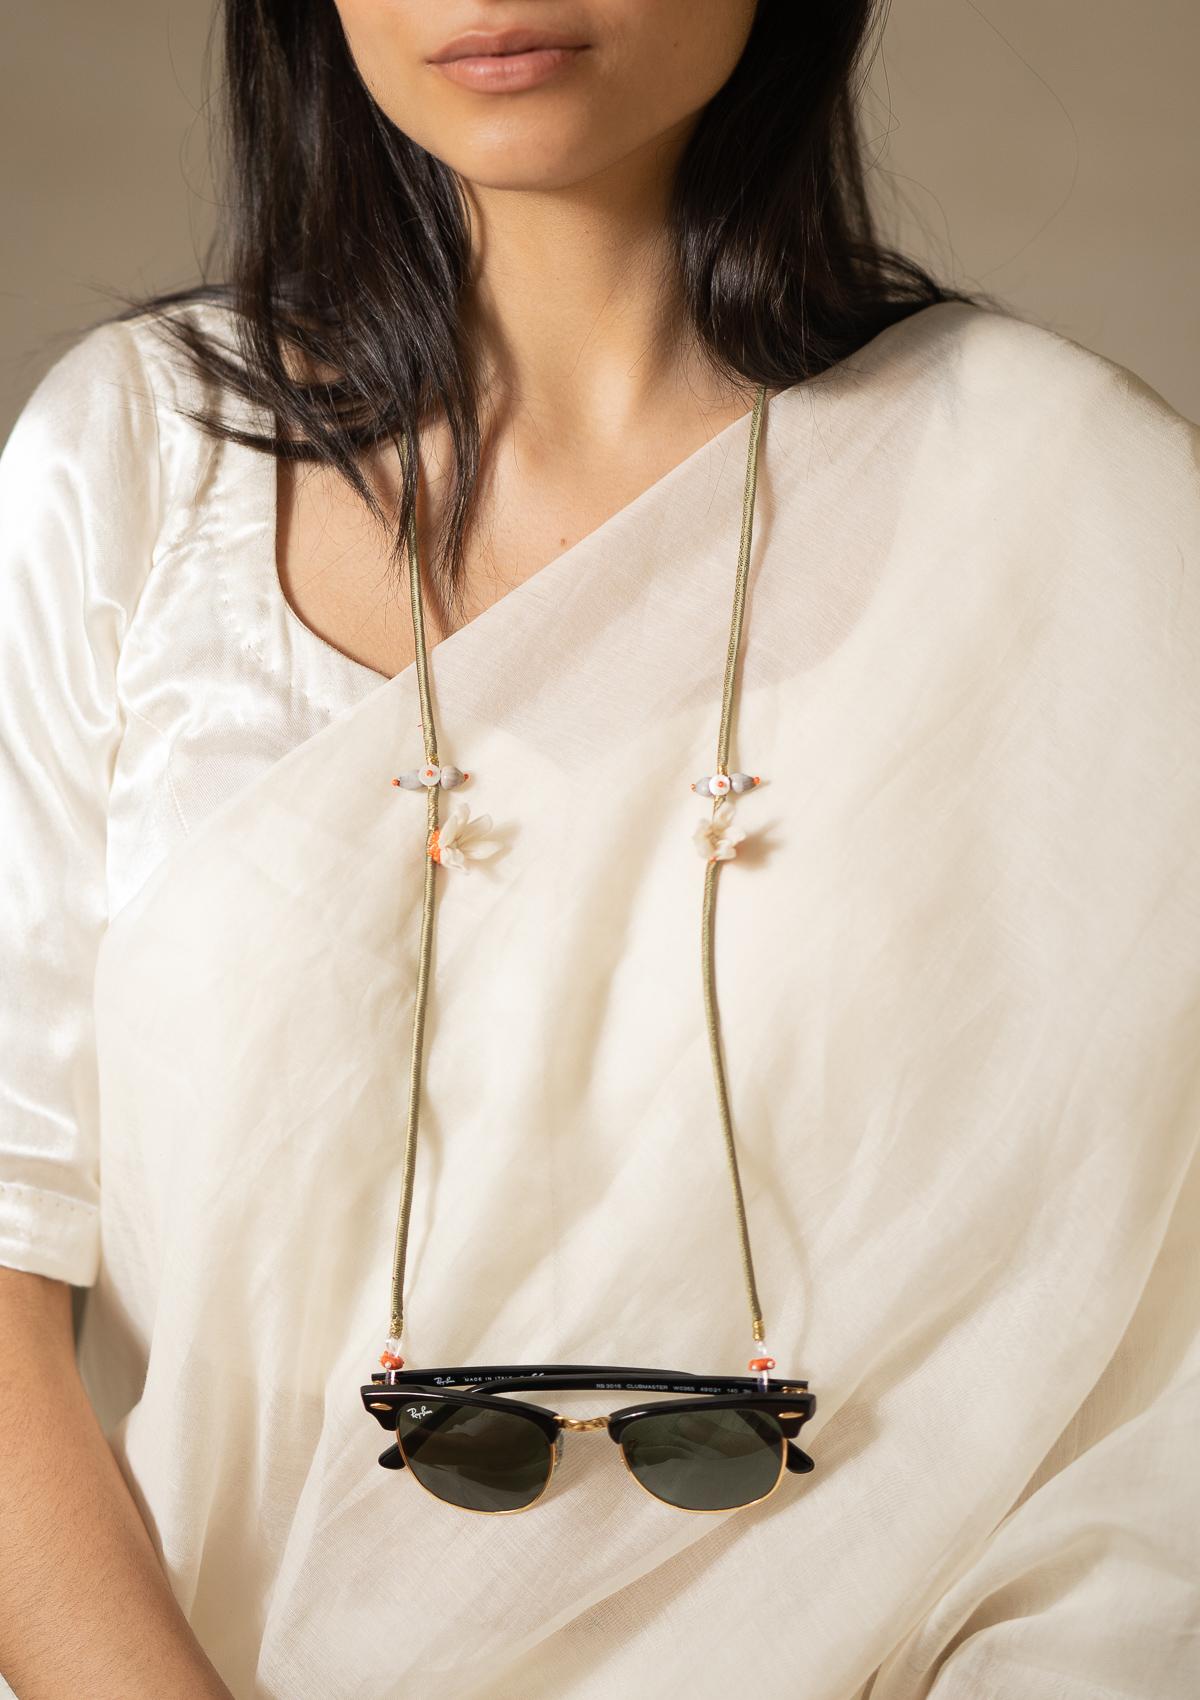 Maracas Floral Eyewear Chain